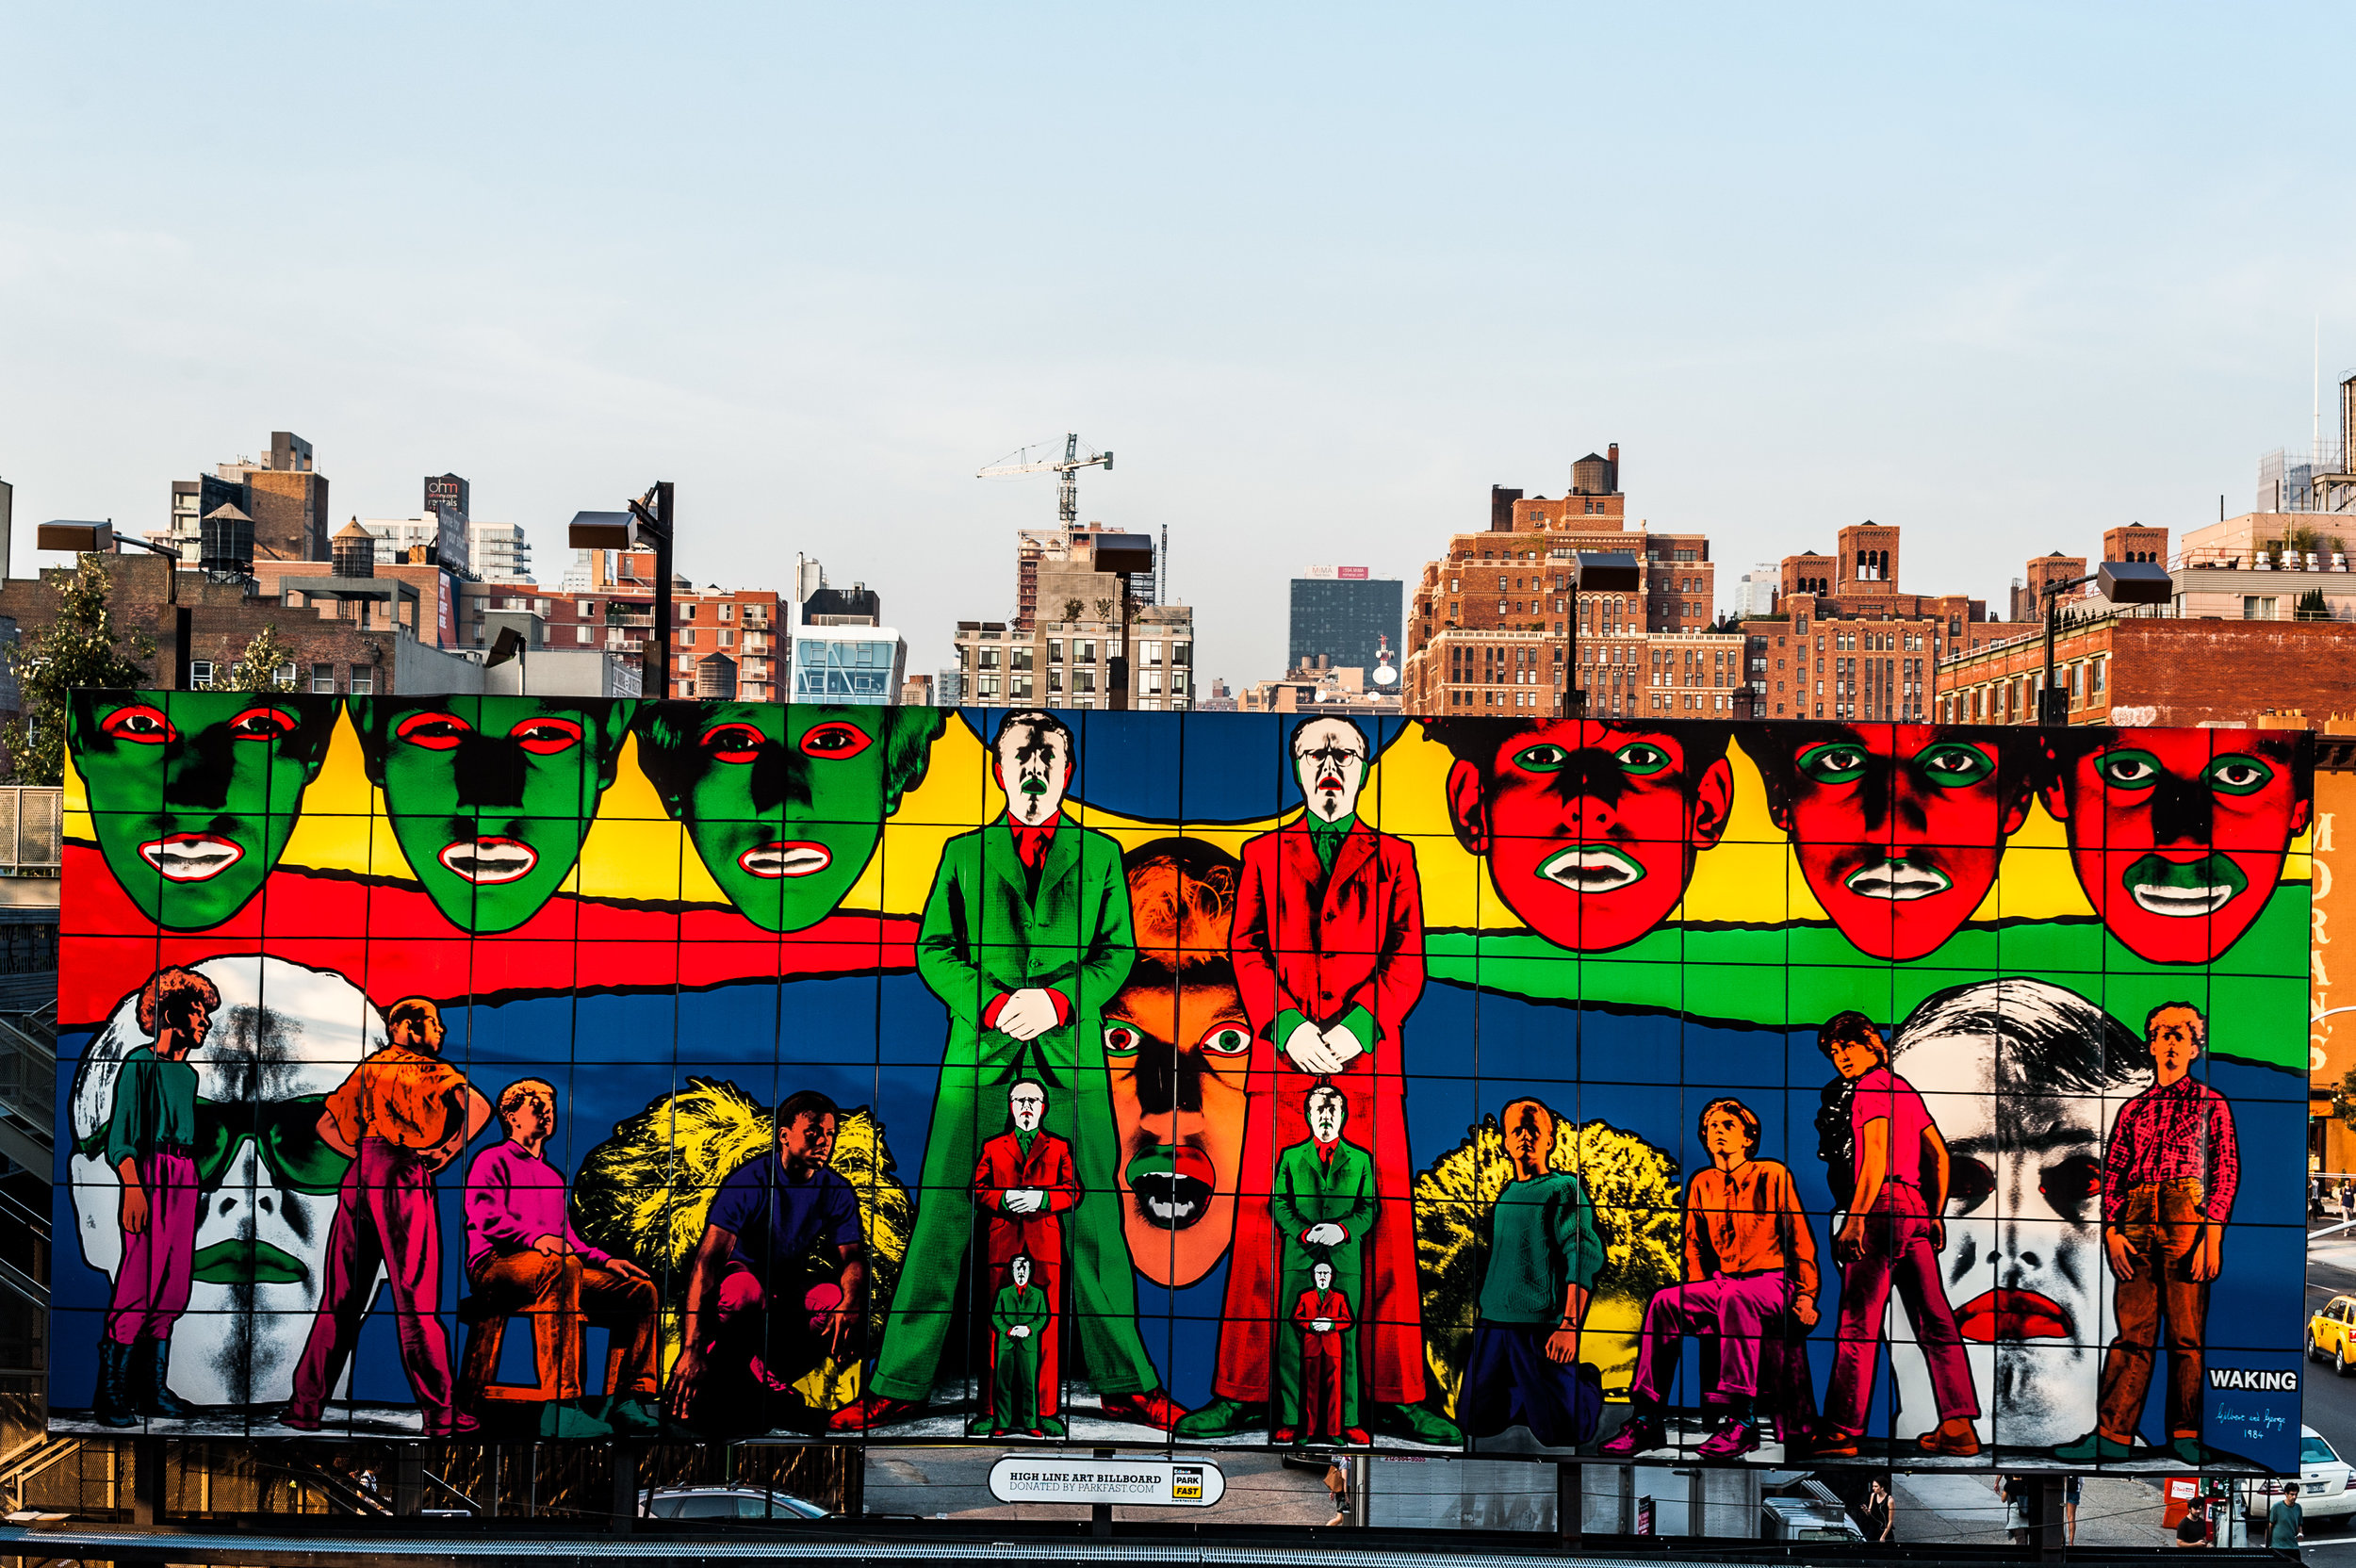 High Line Art Billboard - Gilbert & George'sWaking